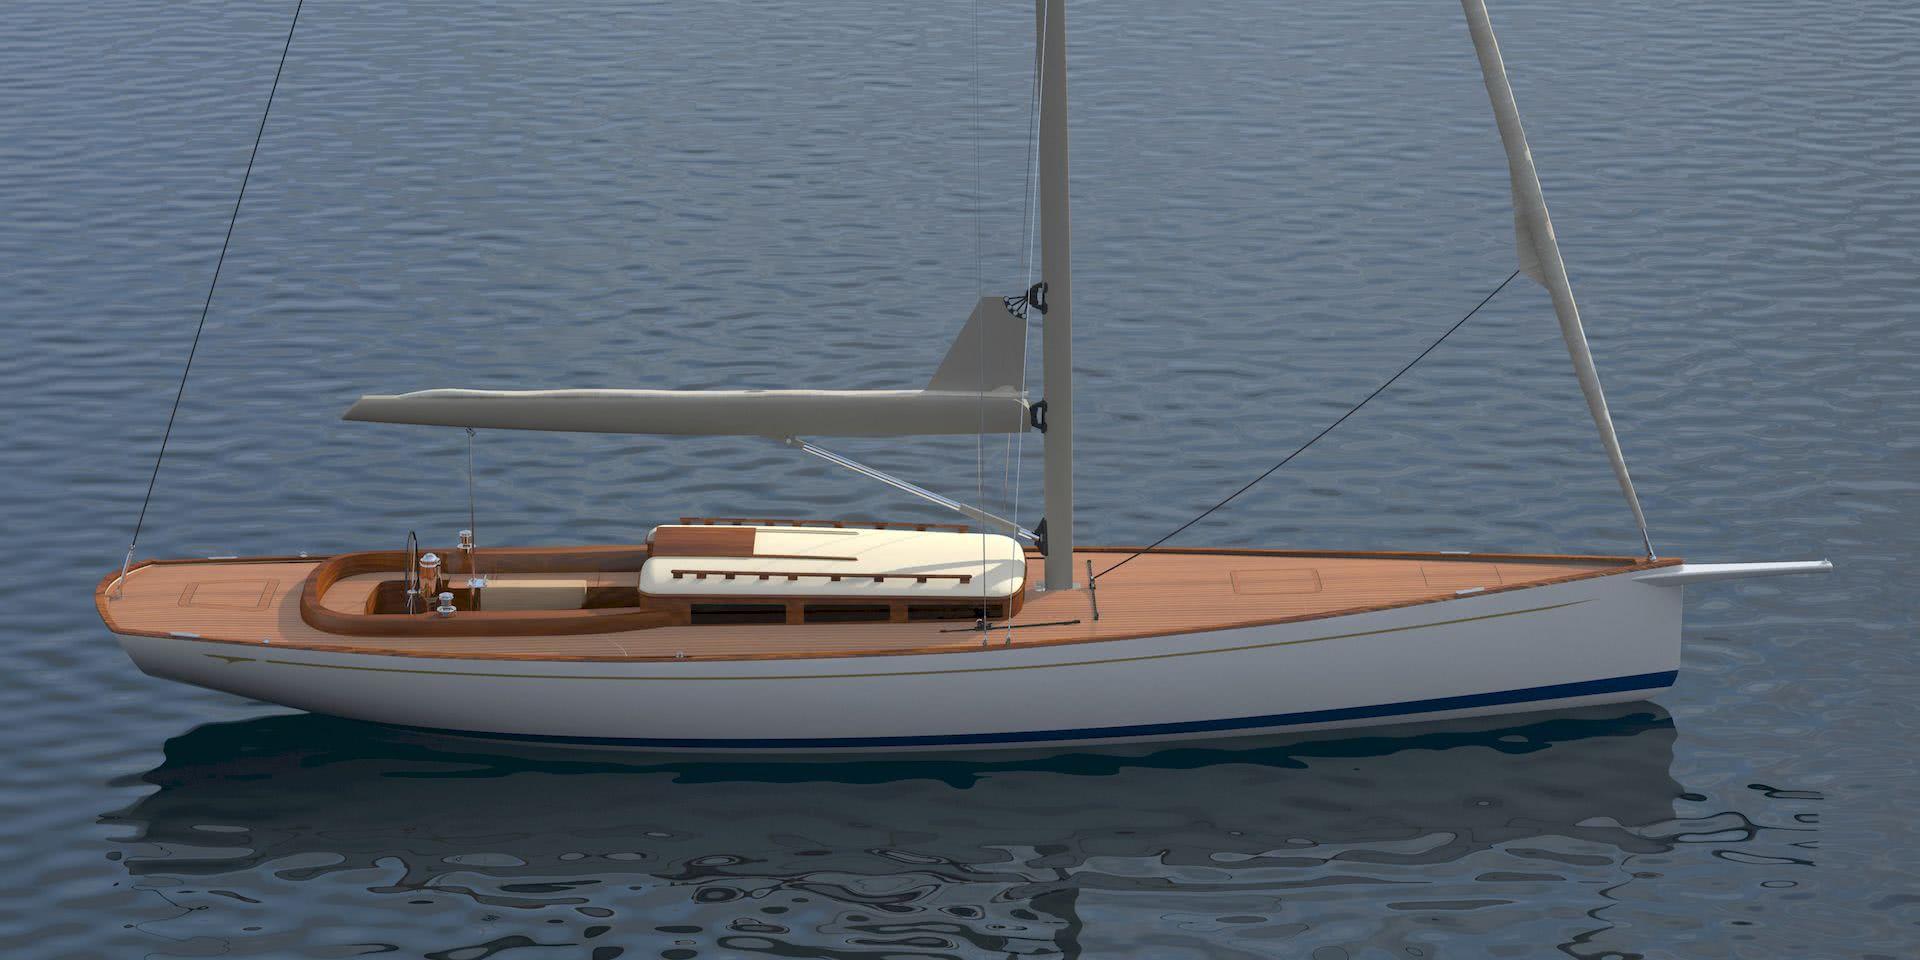 Trintella 50 German Frers Sailing Yacht